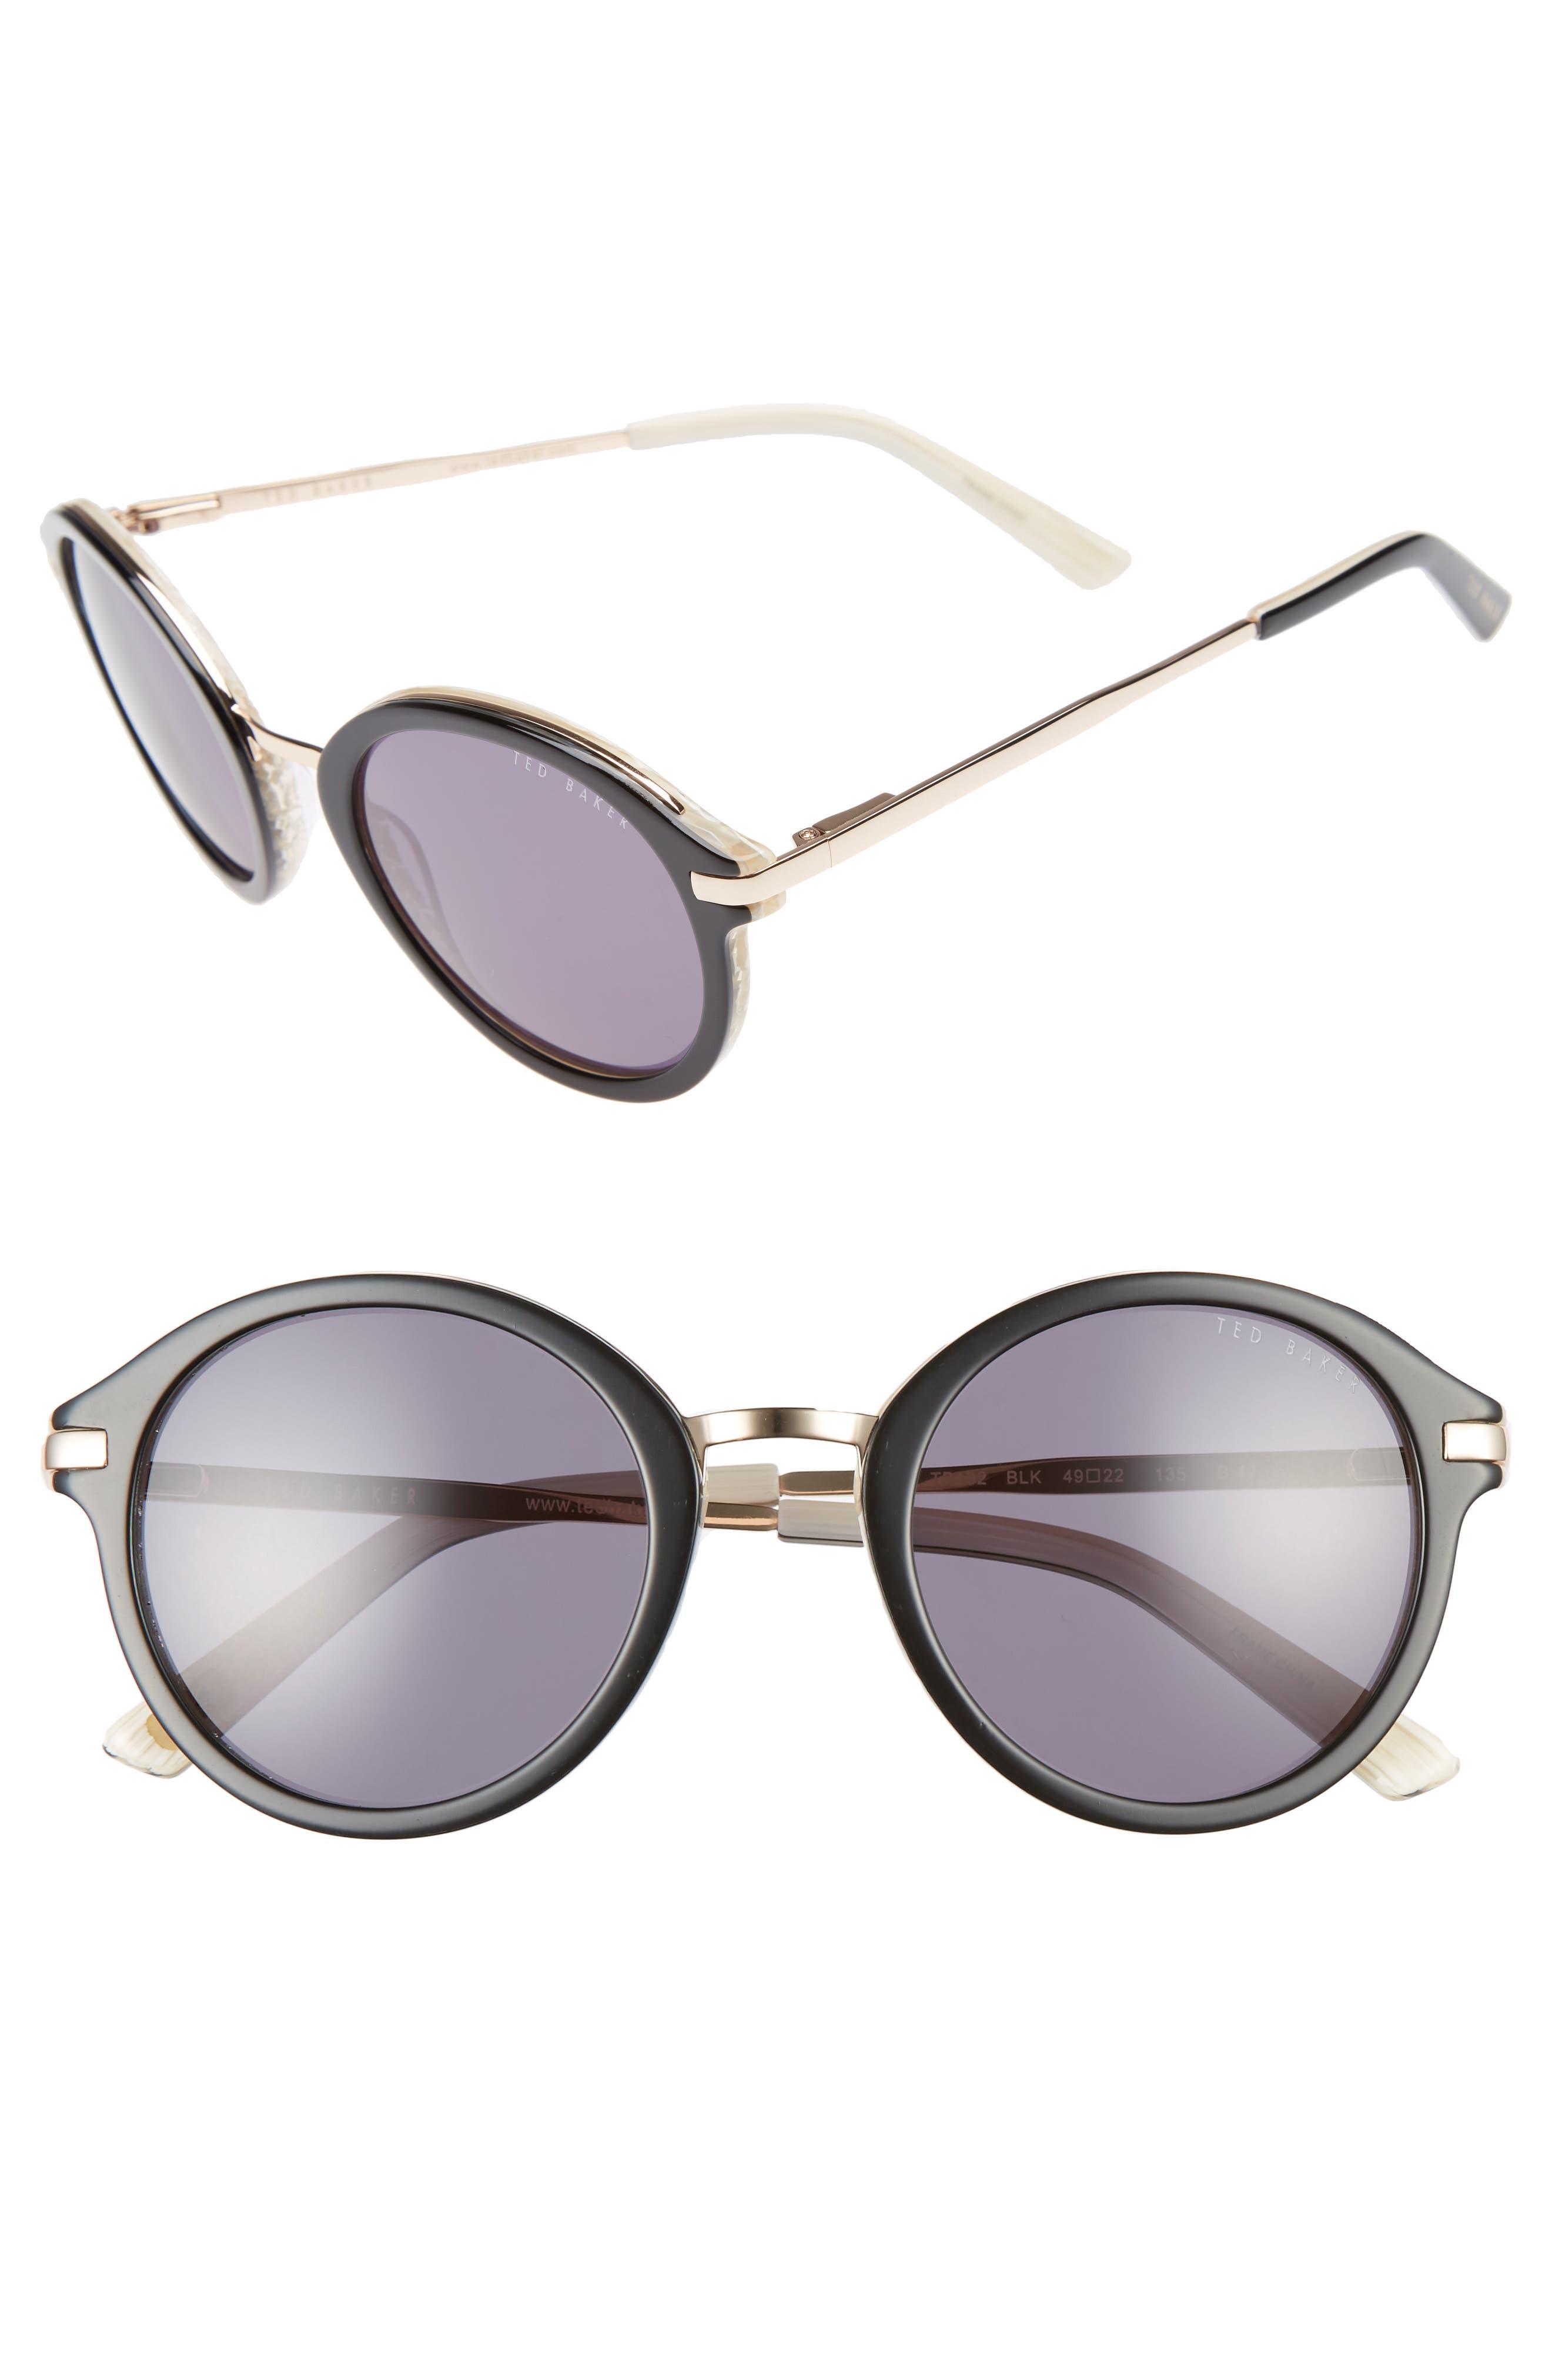 49mm Round Sunglasses,                             Main thumbnail 1, color,